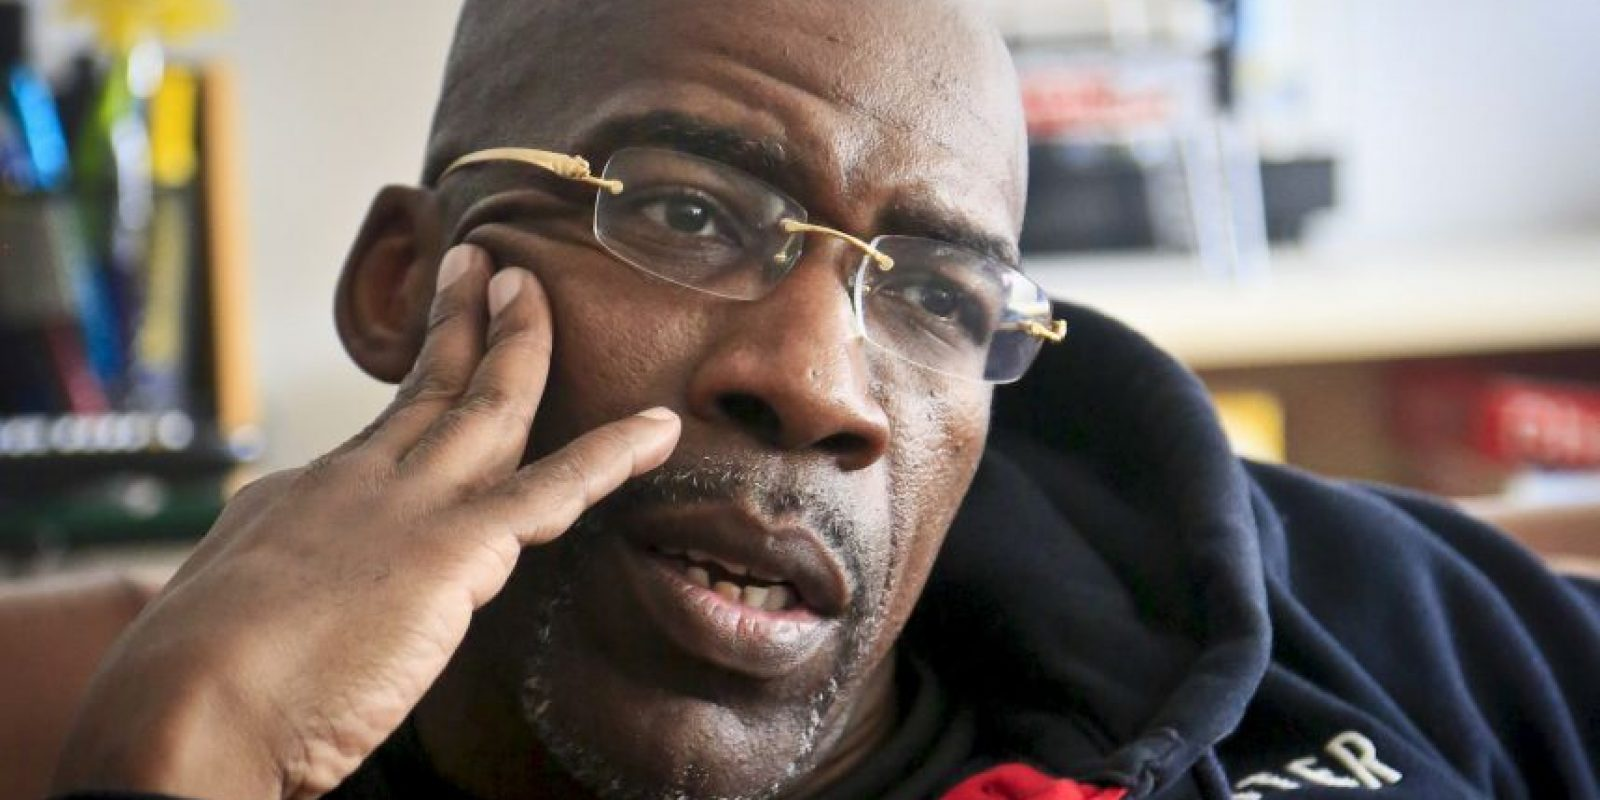 Jonathan Fleming pasó 25 años en la cárcel por un crimen que no cometió. Foto:AP